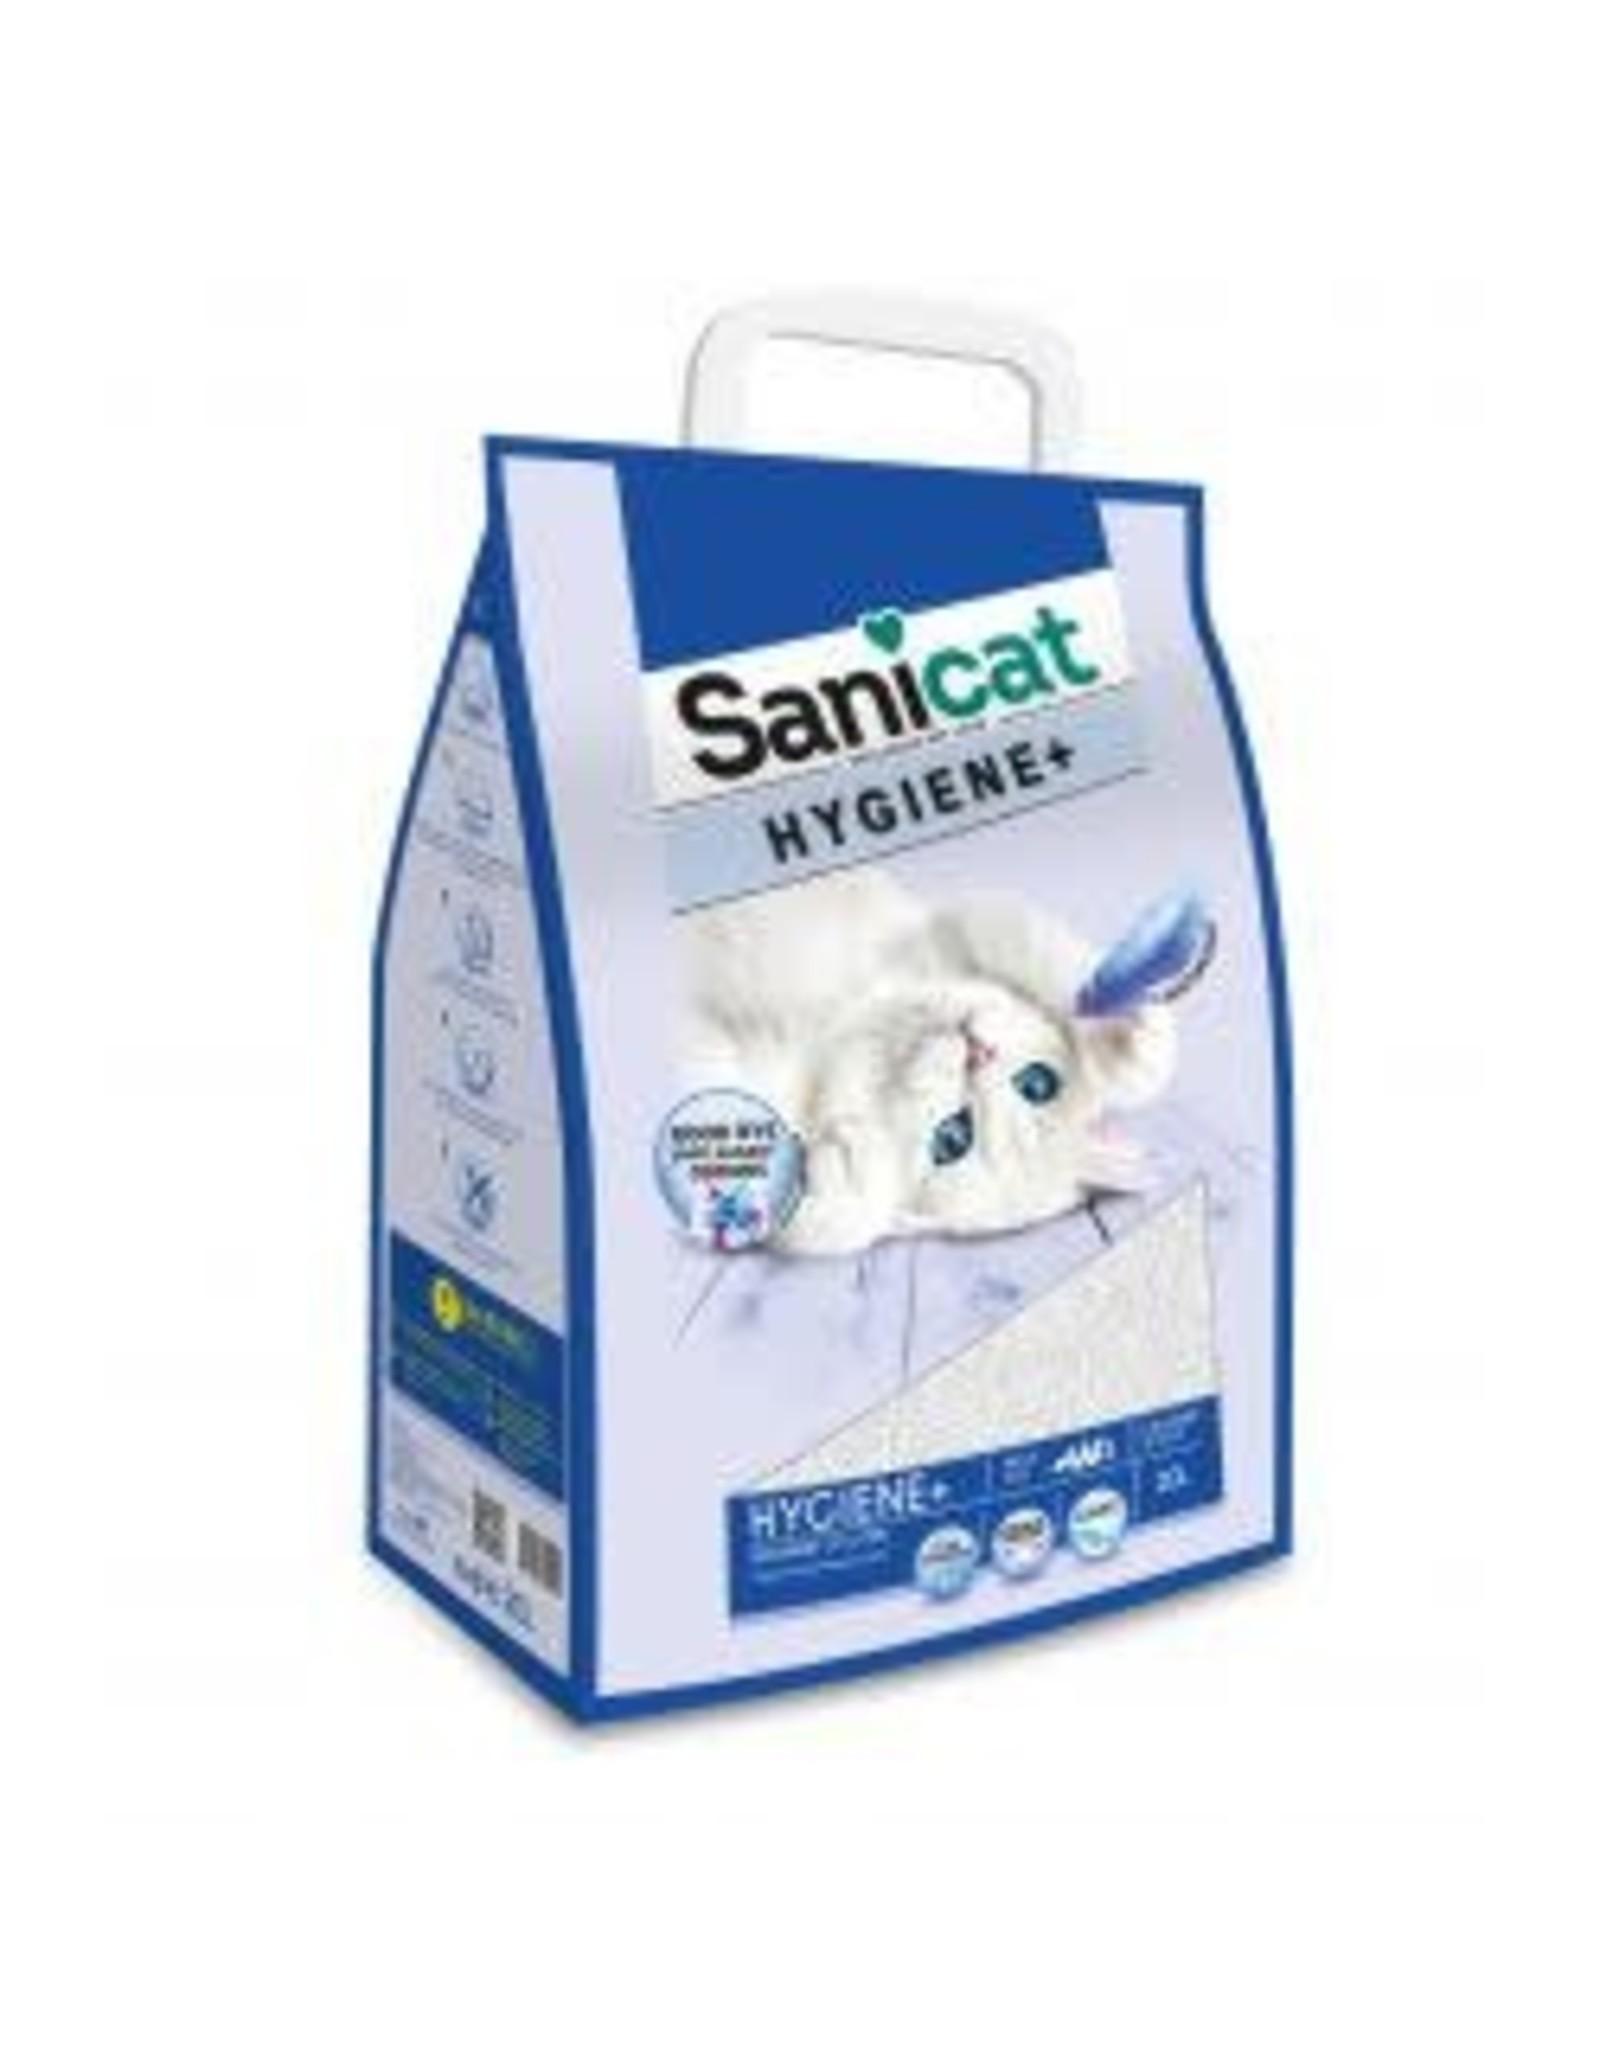 Sanicat Sanicat Hygiene+ Litter 20L